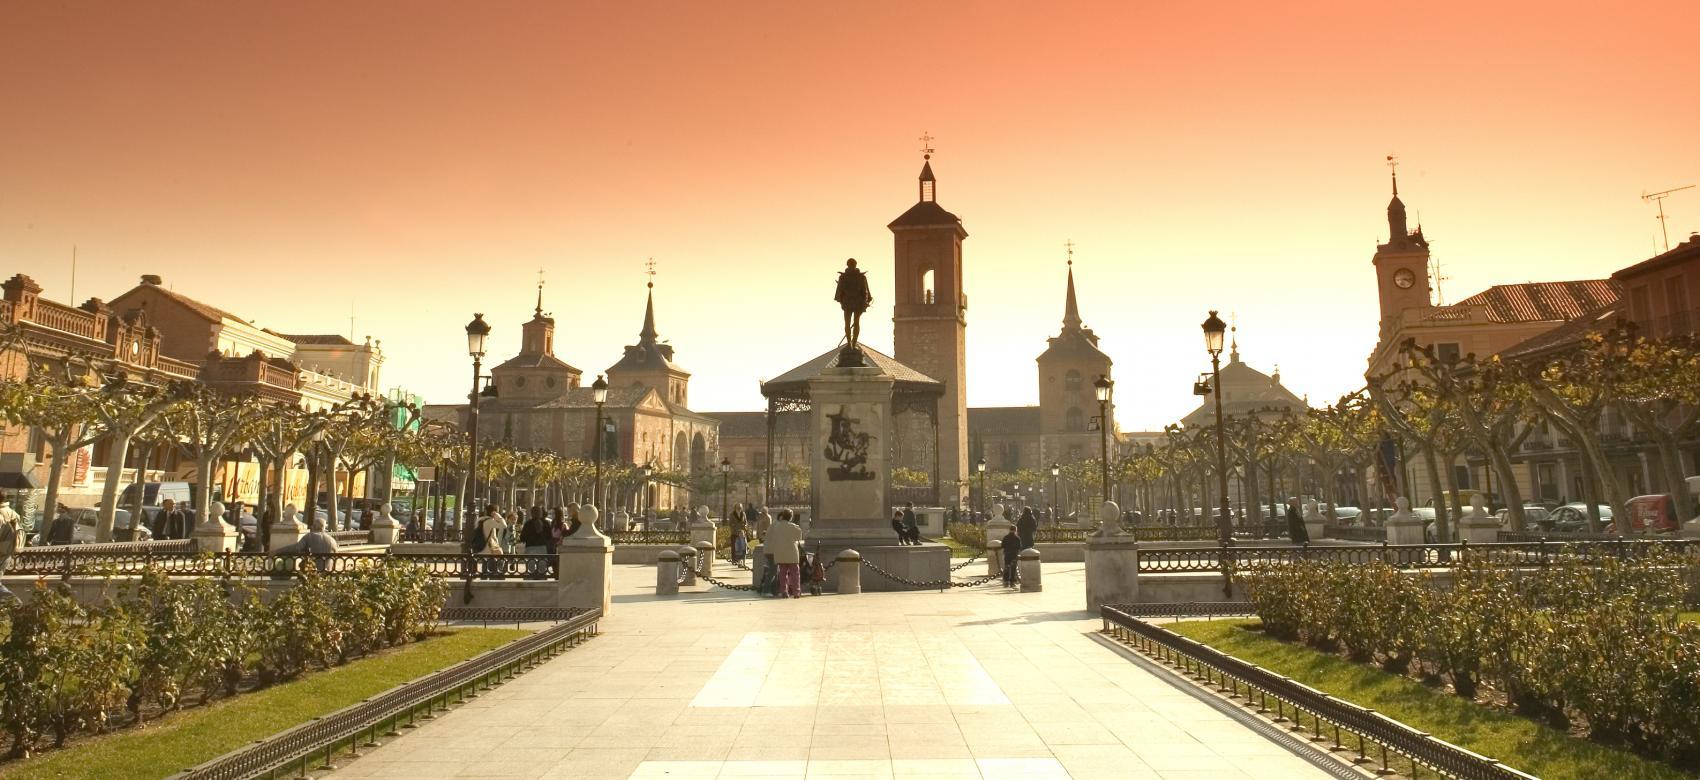 Plaza de Cervantes de Alcalá